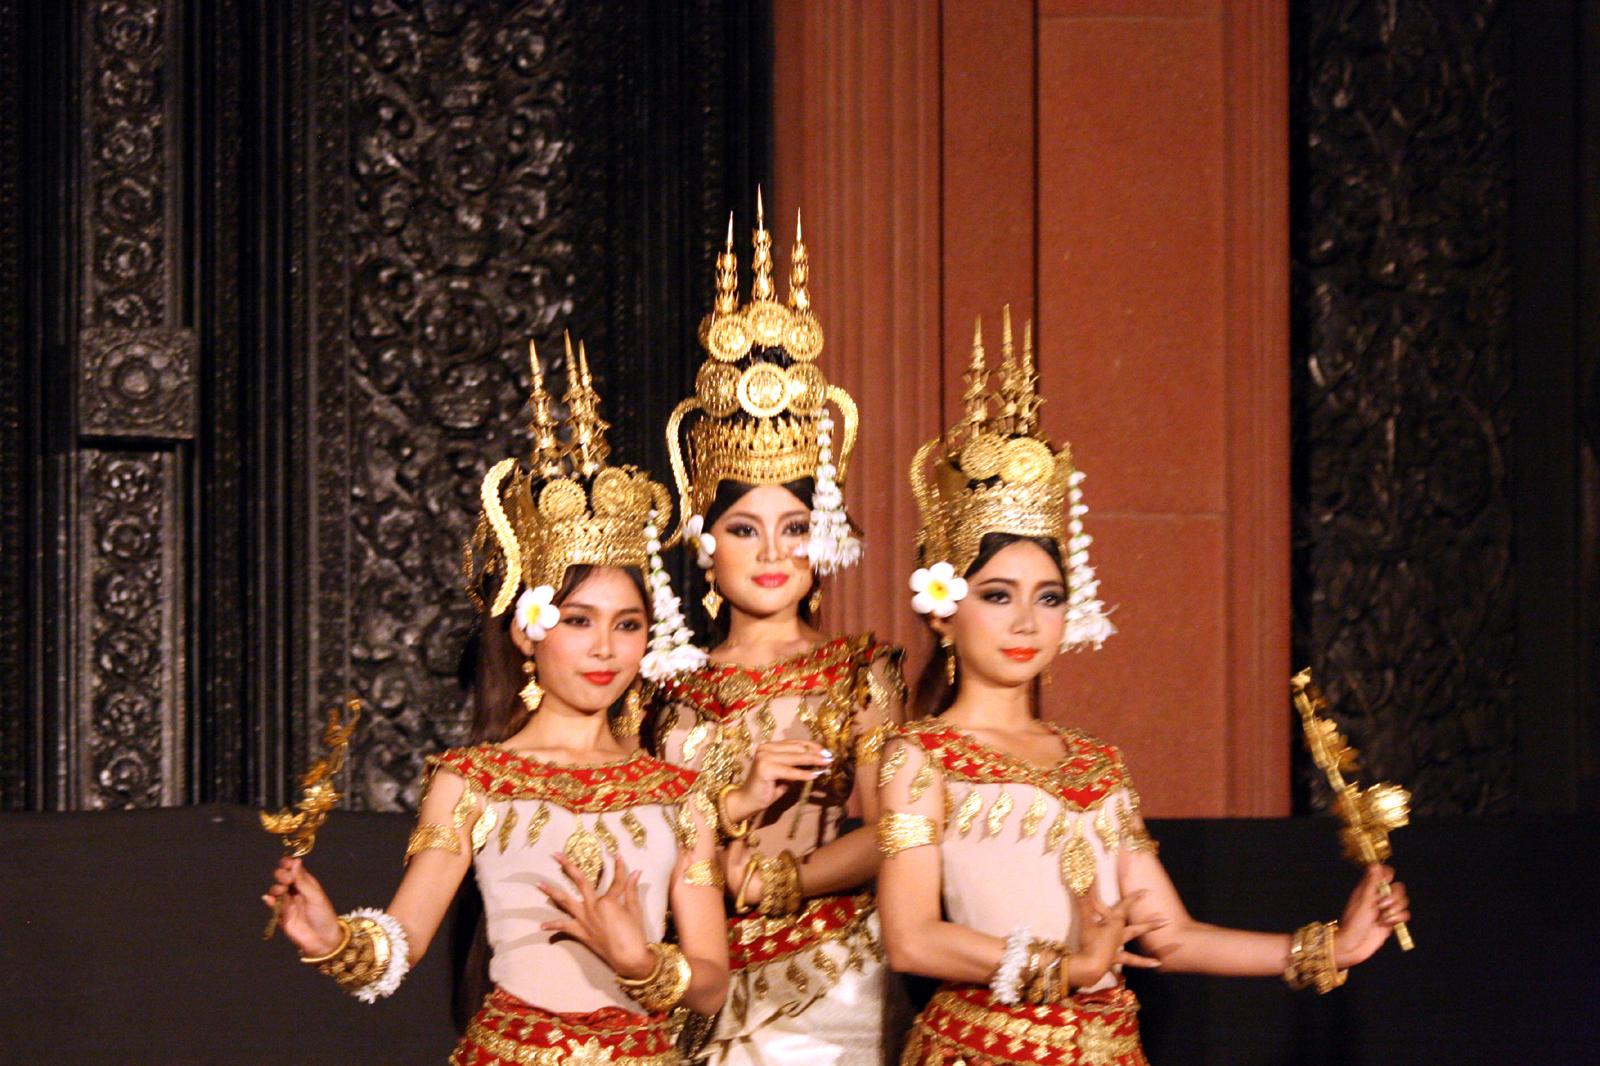 Khmer Apsara dancers. Photo taken on January 5, 2012.